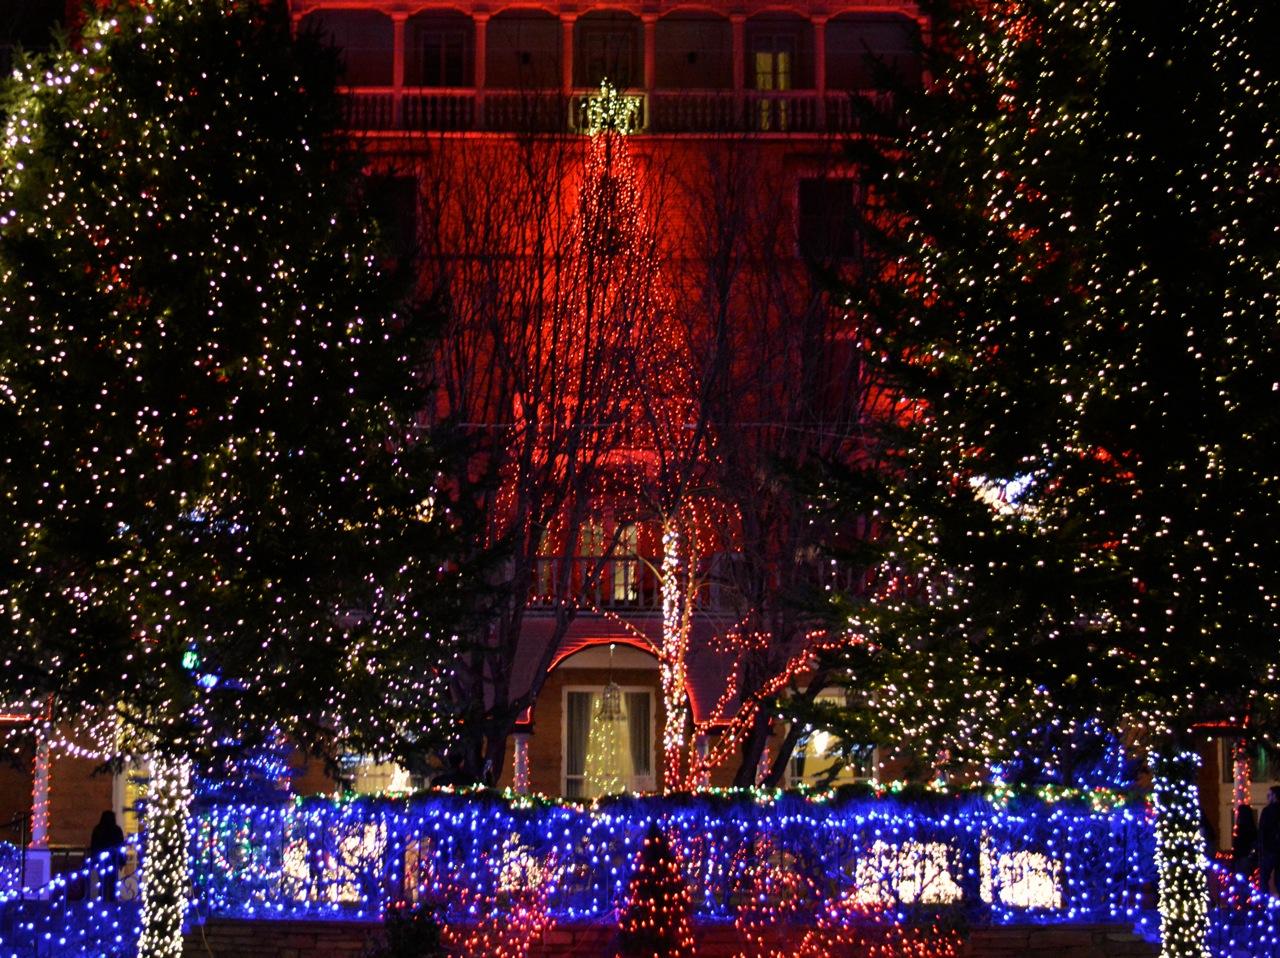 Colorado Hotel Glenwood Springs at Christmastime 33.jpg